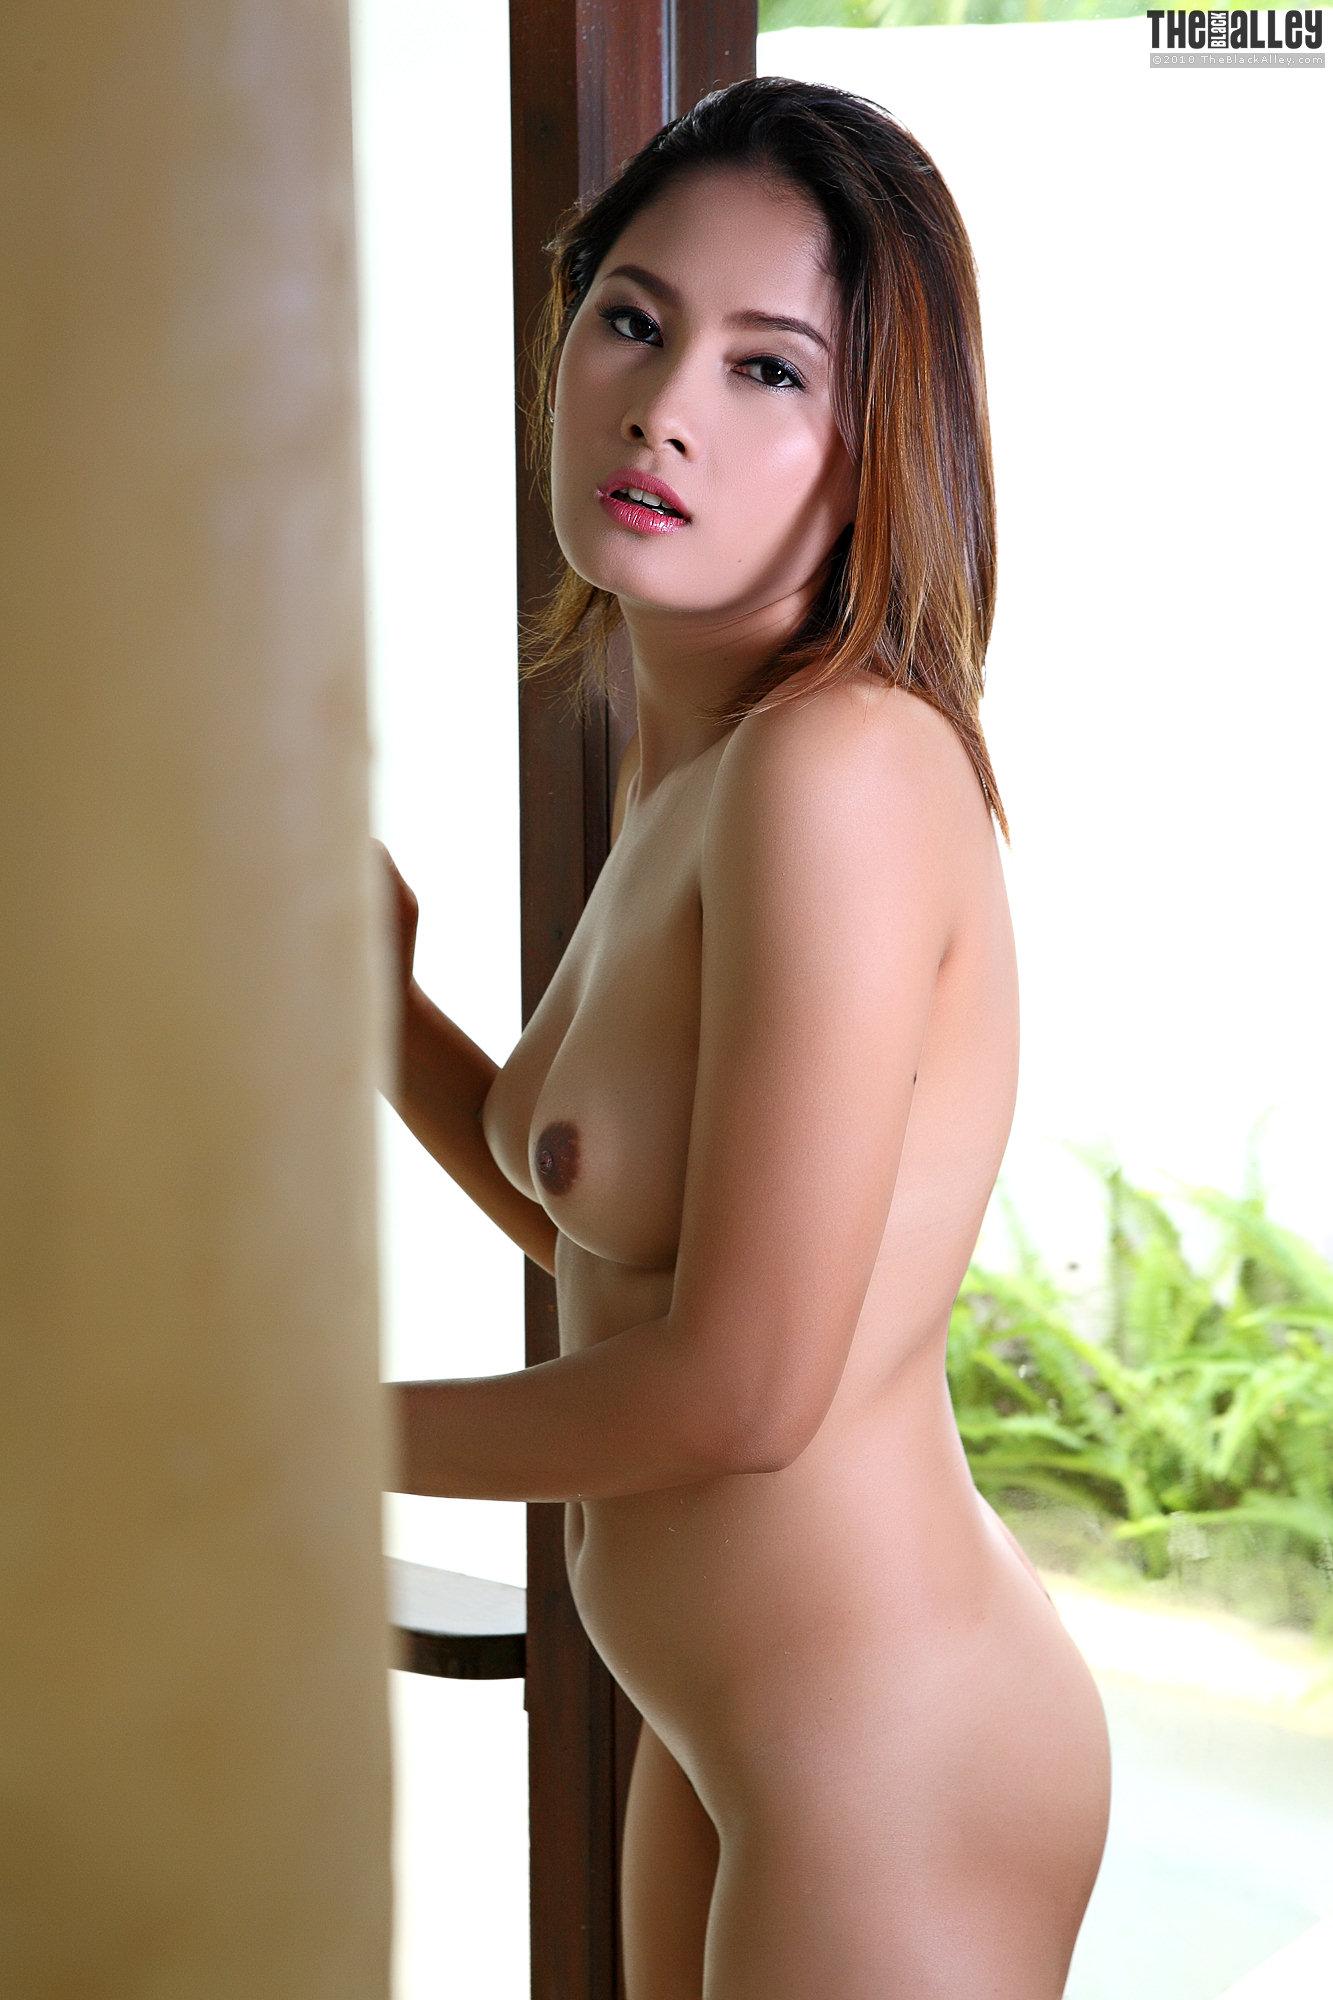 litu 100 archives: Winny Sung set 23